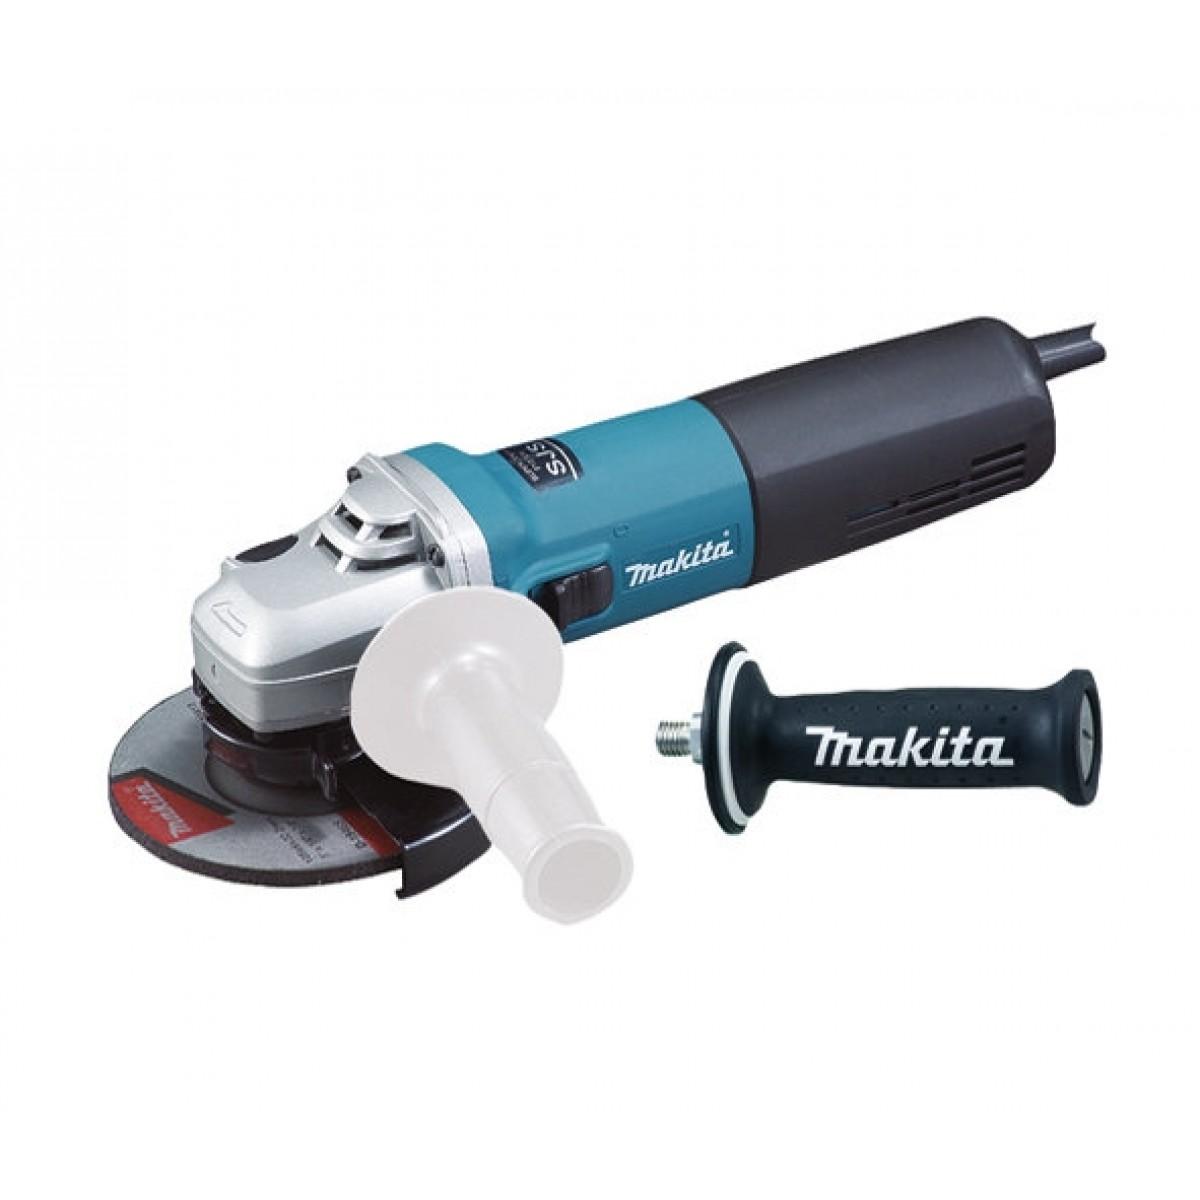 Makita vinkelsliber Ø125mm - 1400W - 9565CVR